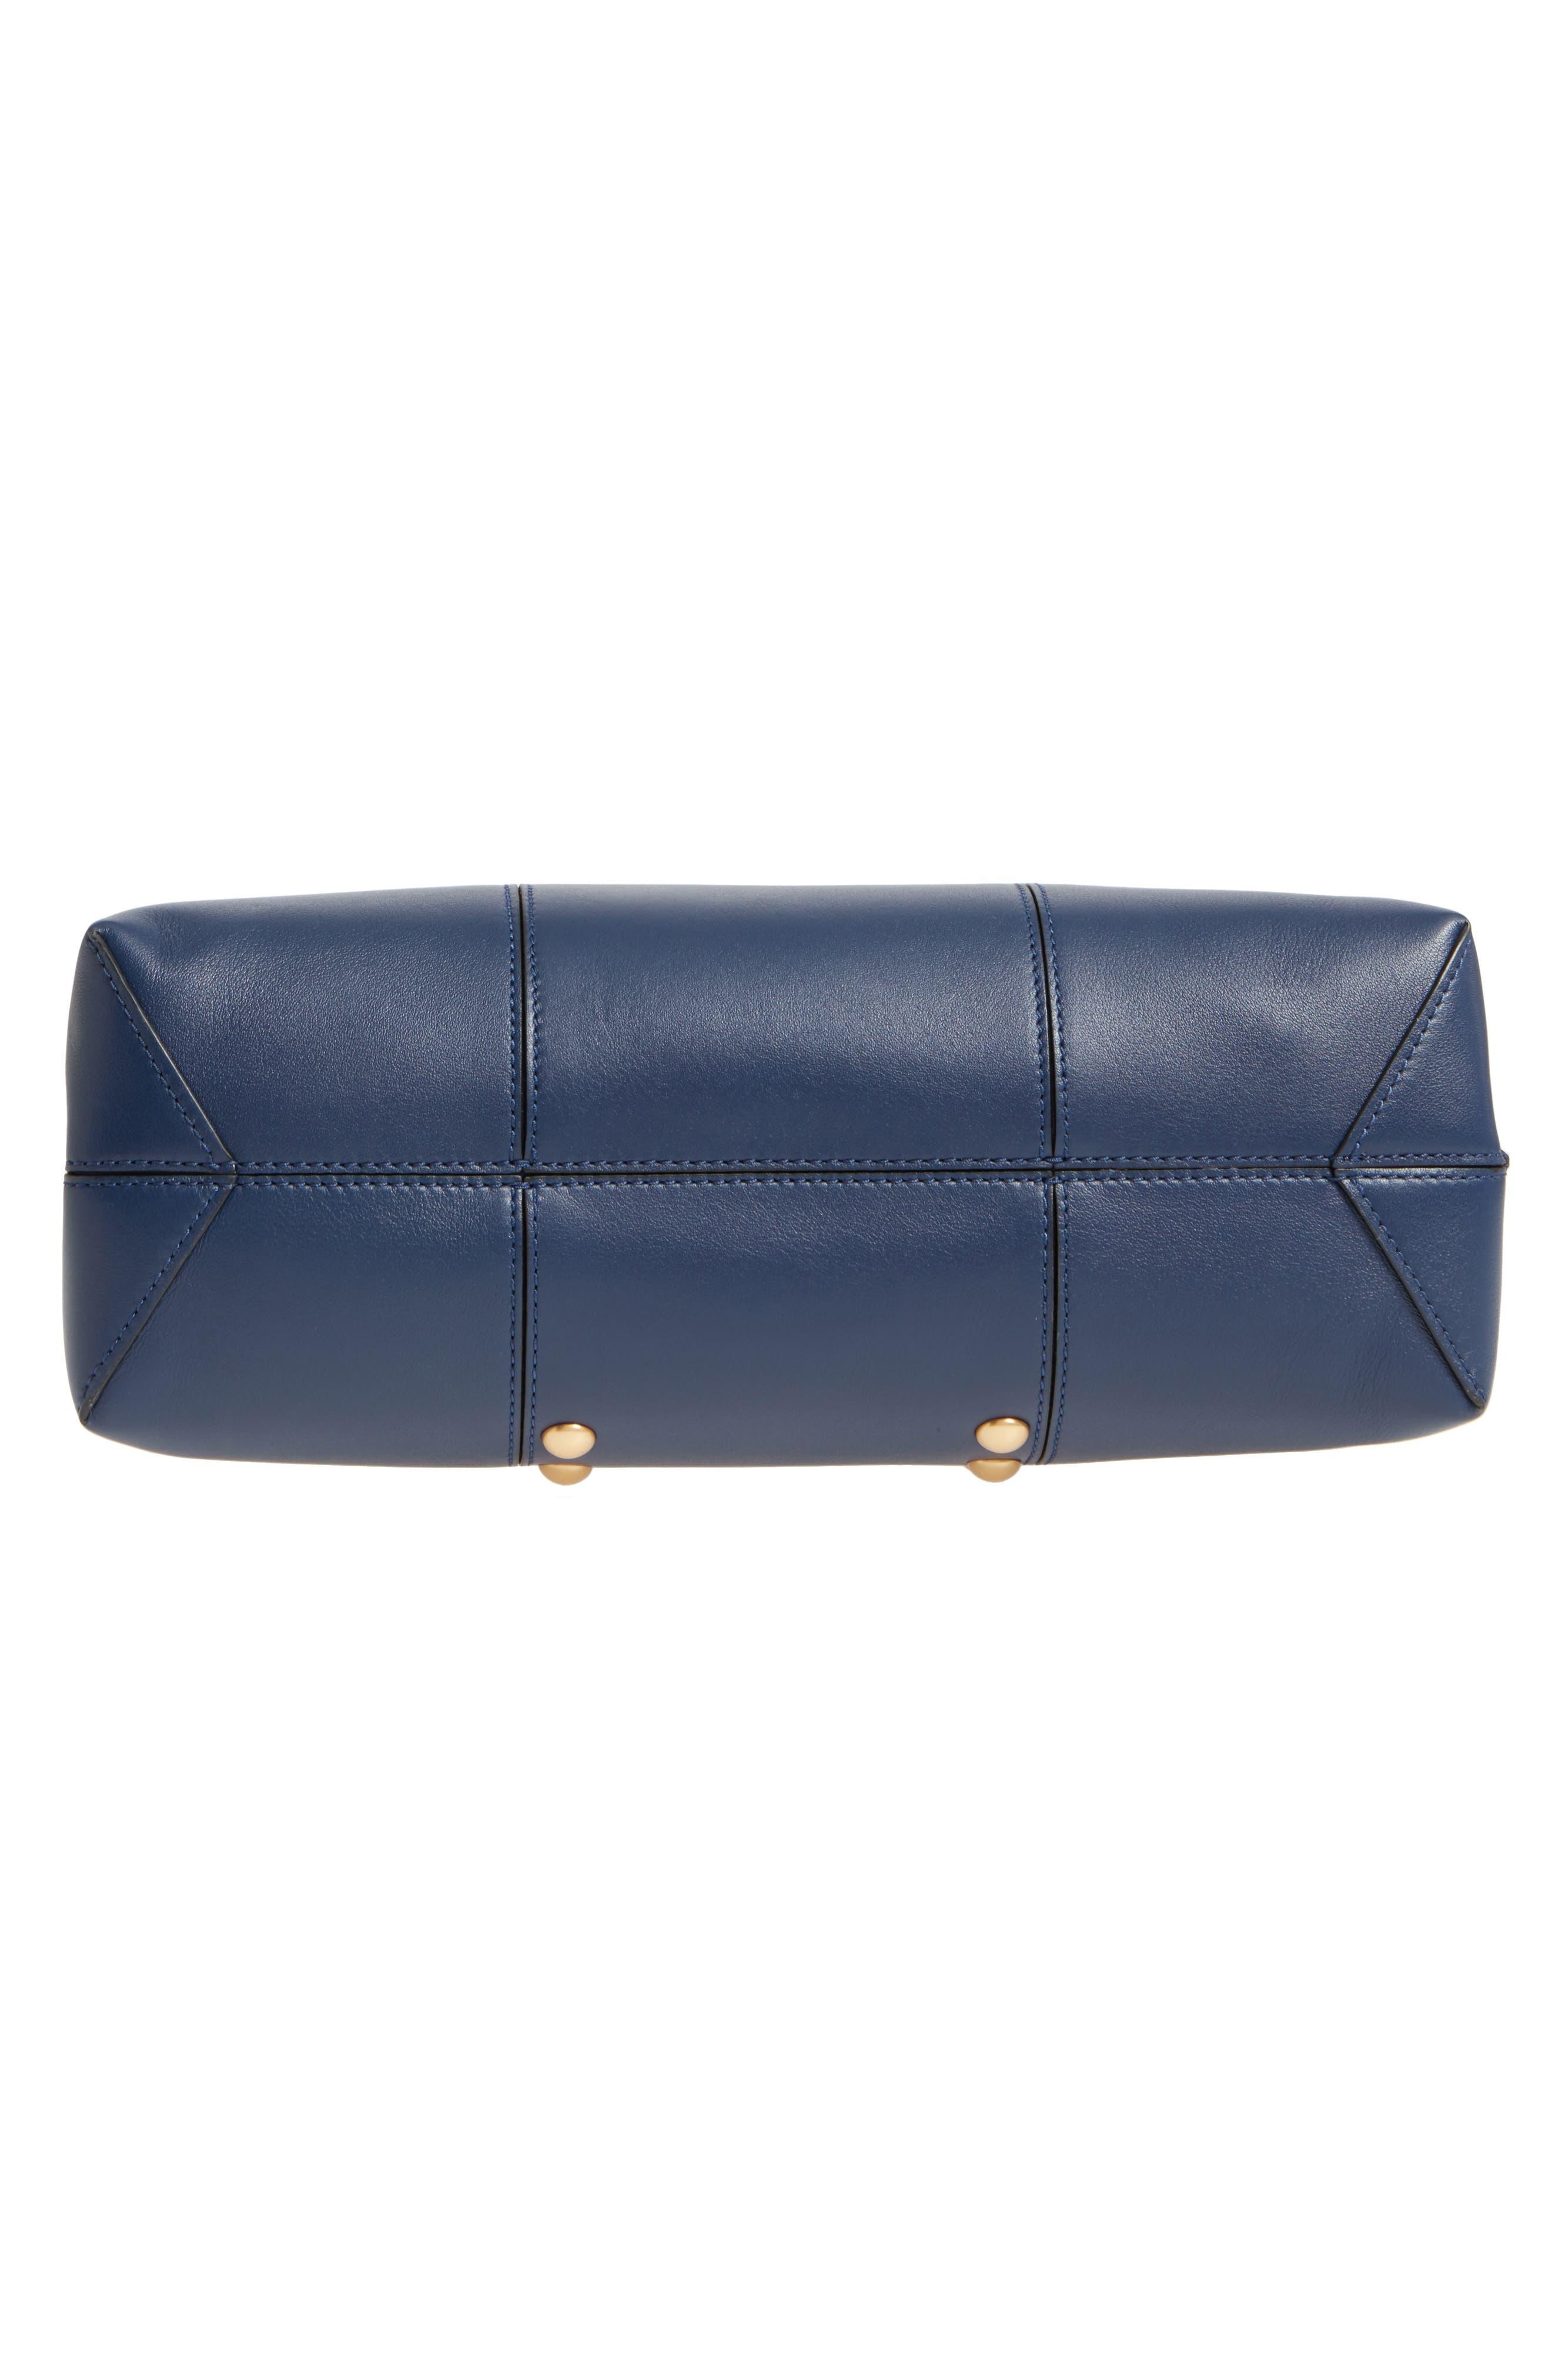 Block-T Studded Leather Top Handle Satchel,                             Alternate thumbnail 6, color,                             Royal Navy